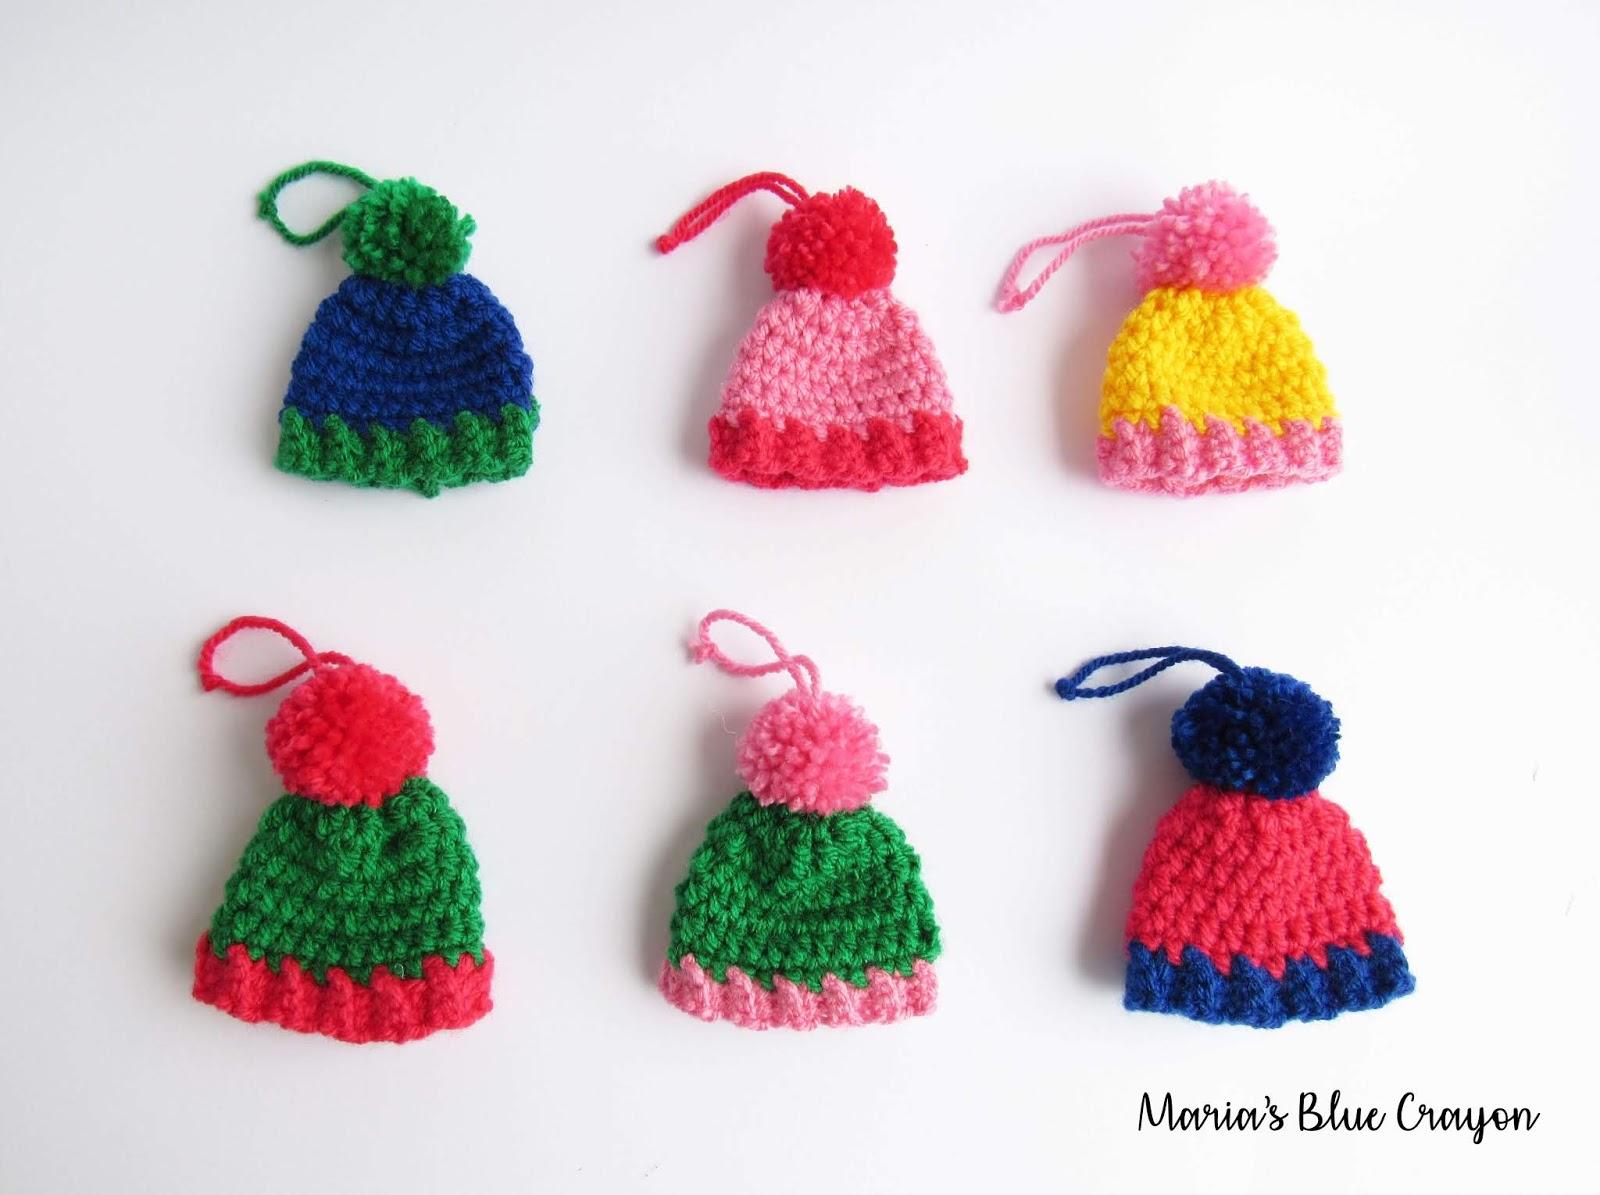 Crochet Christmas Ornaments - Mini Pom Pom Beanies Free Pattern ...